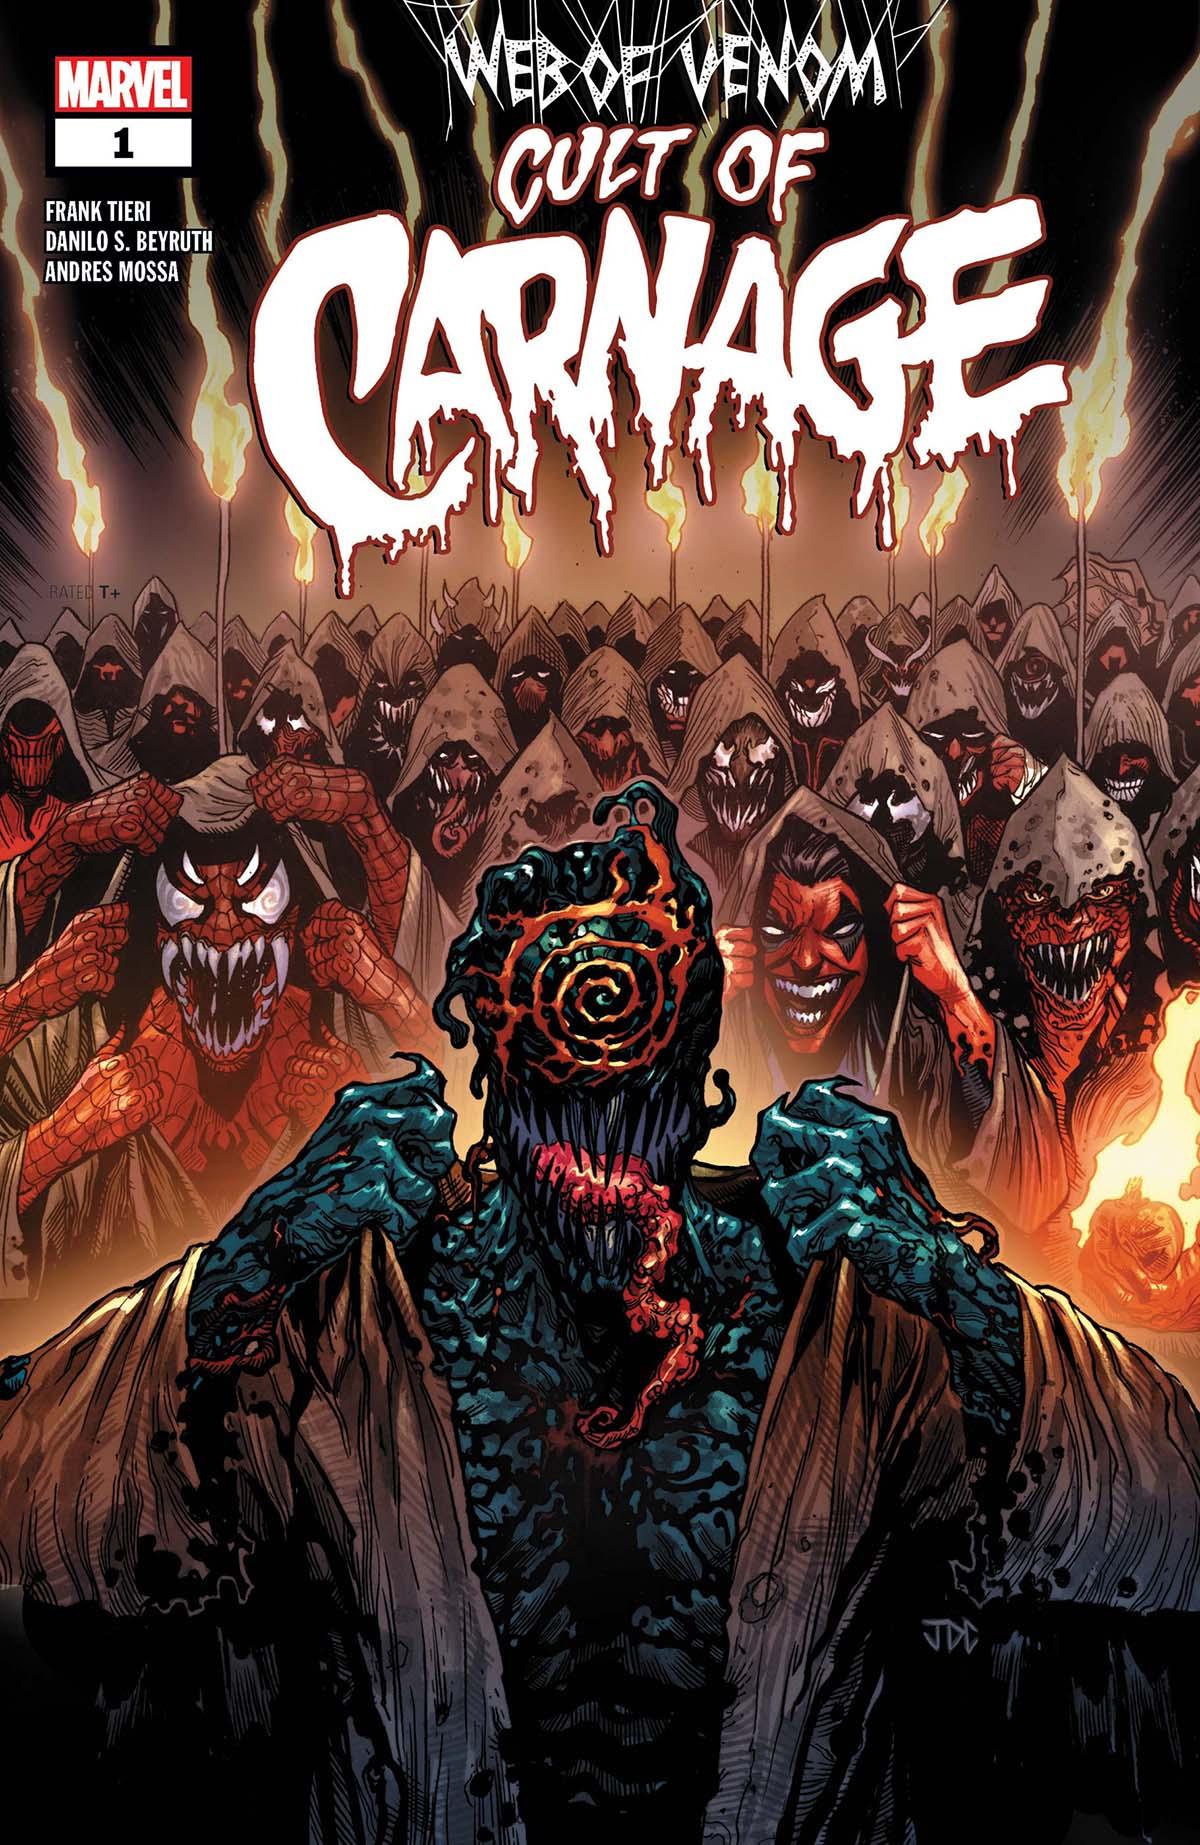 Web Of Venom_Cult Of Carnage (2019) #1.jpg